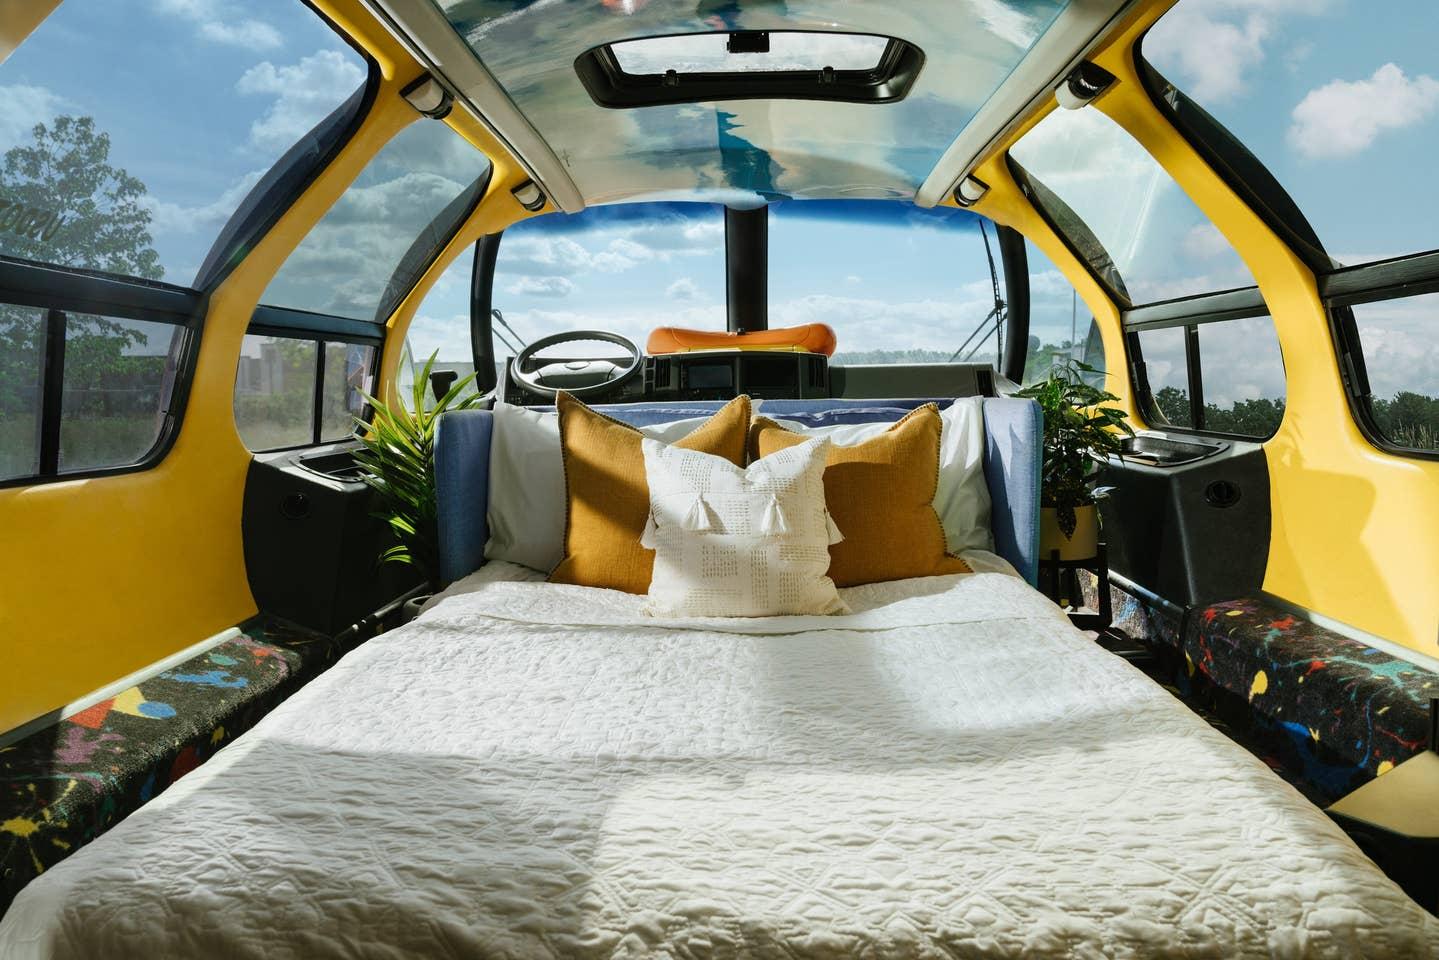 wienermobile_airbnb_3